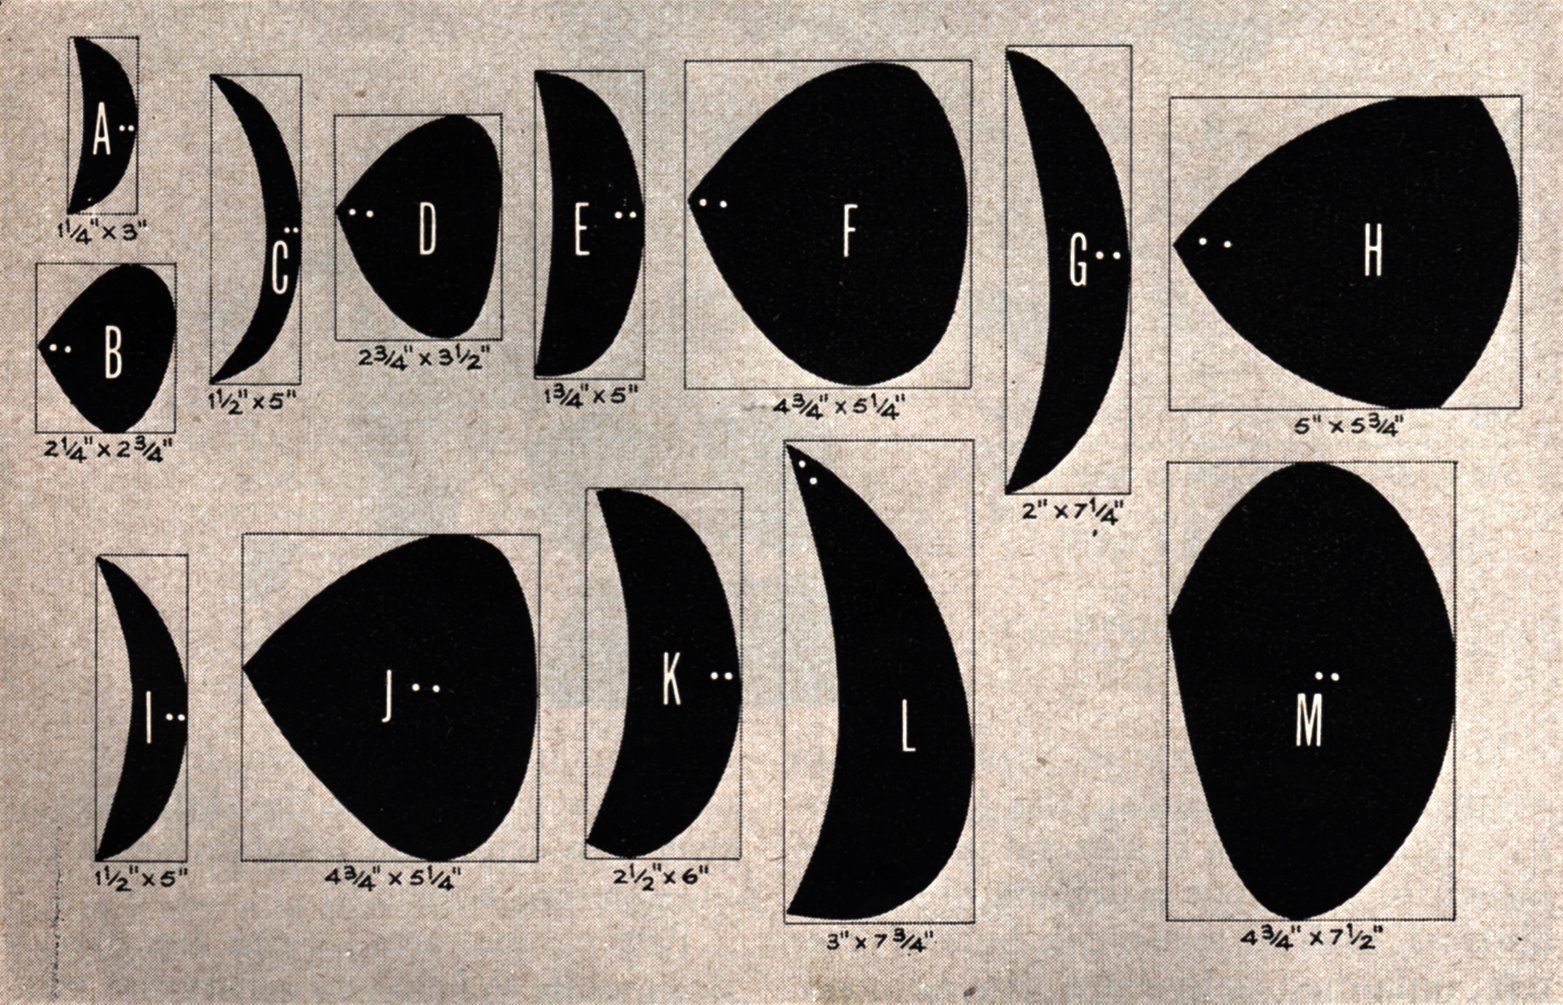 A. Calder, blueprint for abstract mobile http://www.pinterest.com/mariekazalia/kinetic/